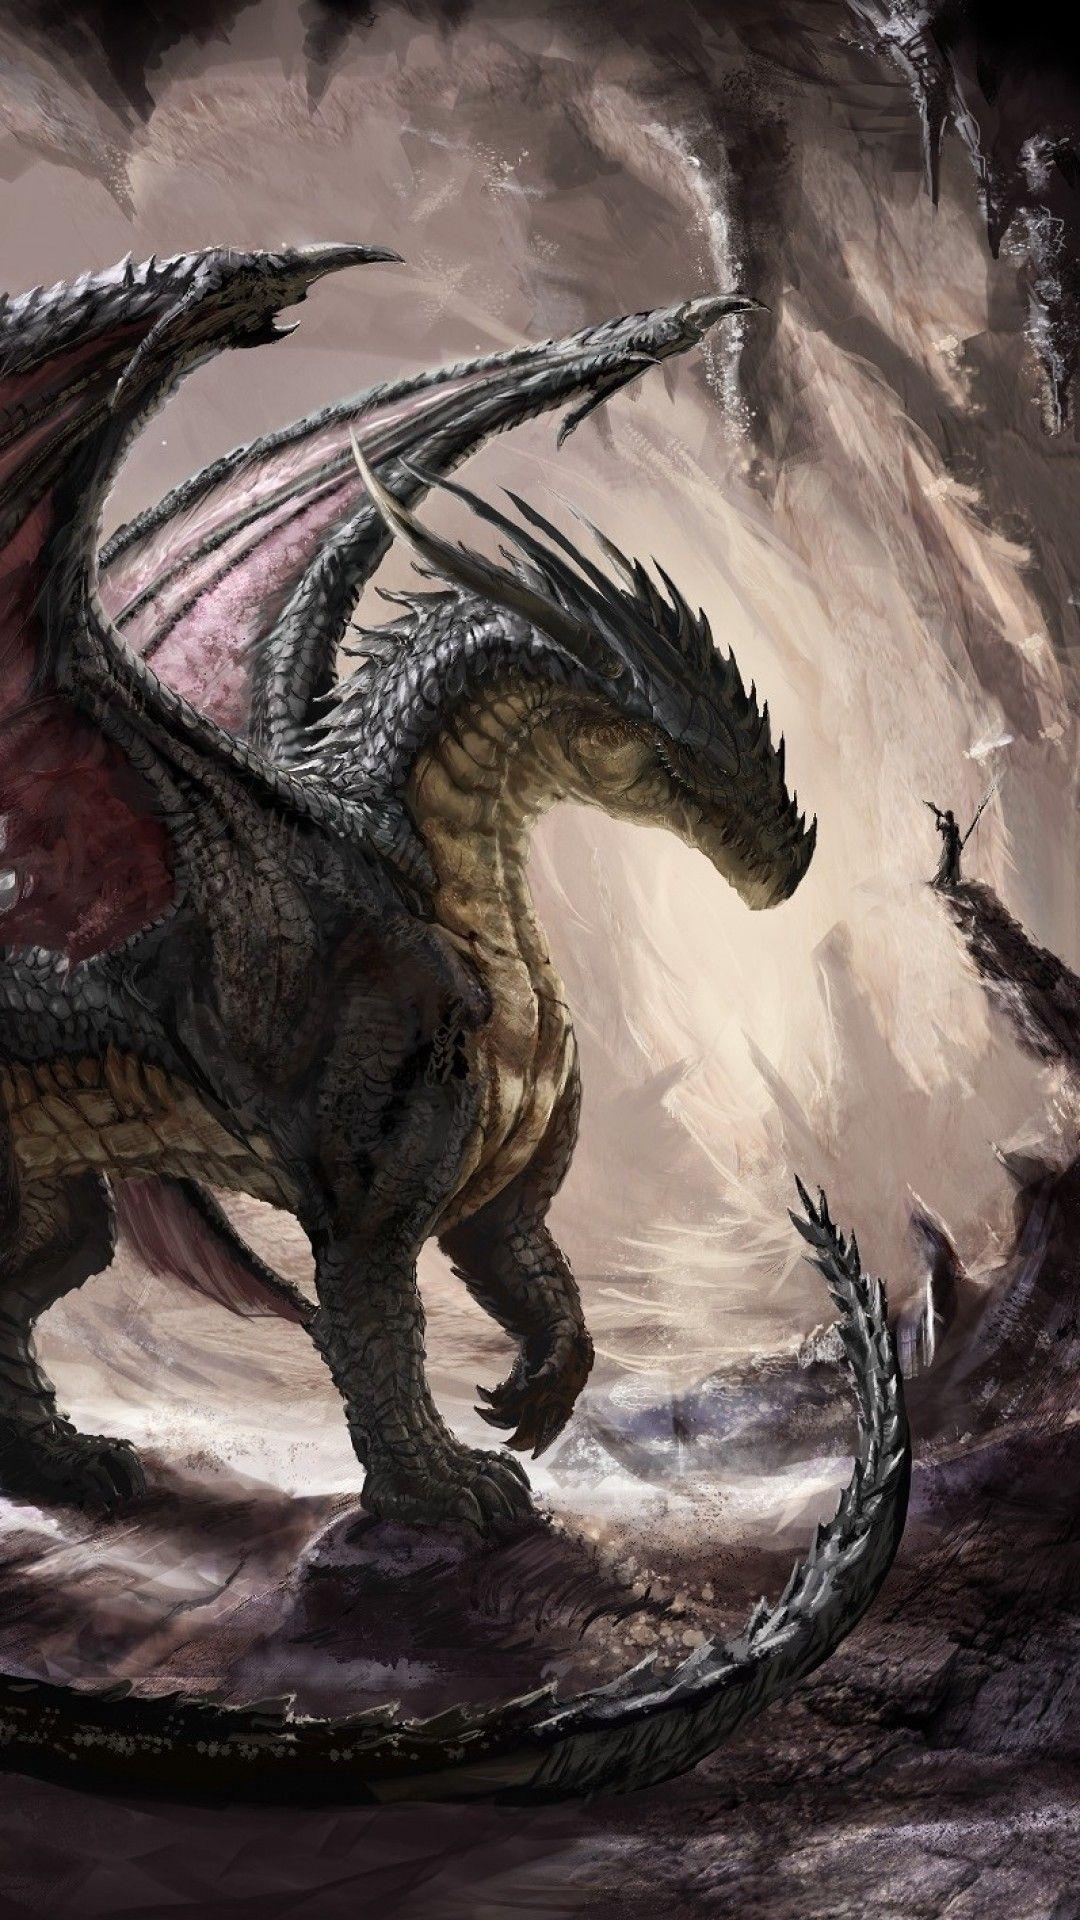 Epic Dragon Phone Wallpaper Dragon Wallpaper Iphone Art Dnd Backgrounds